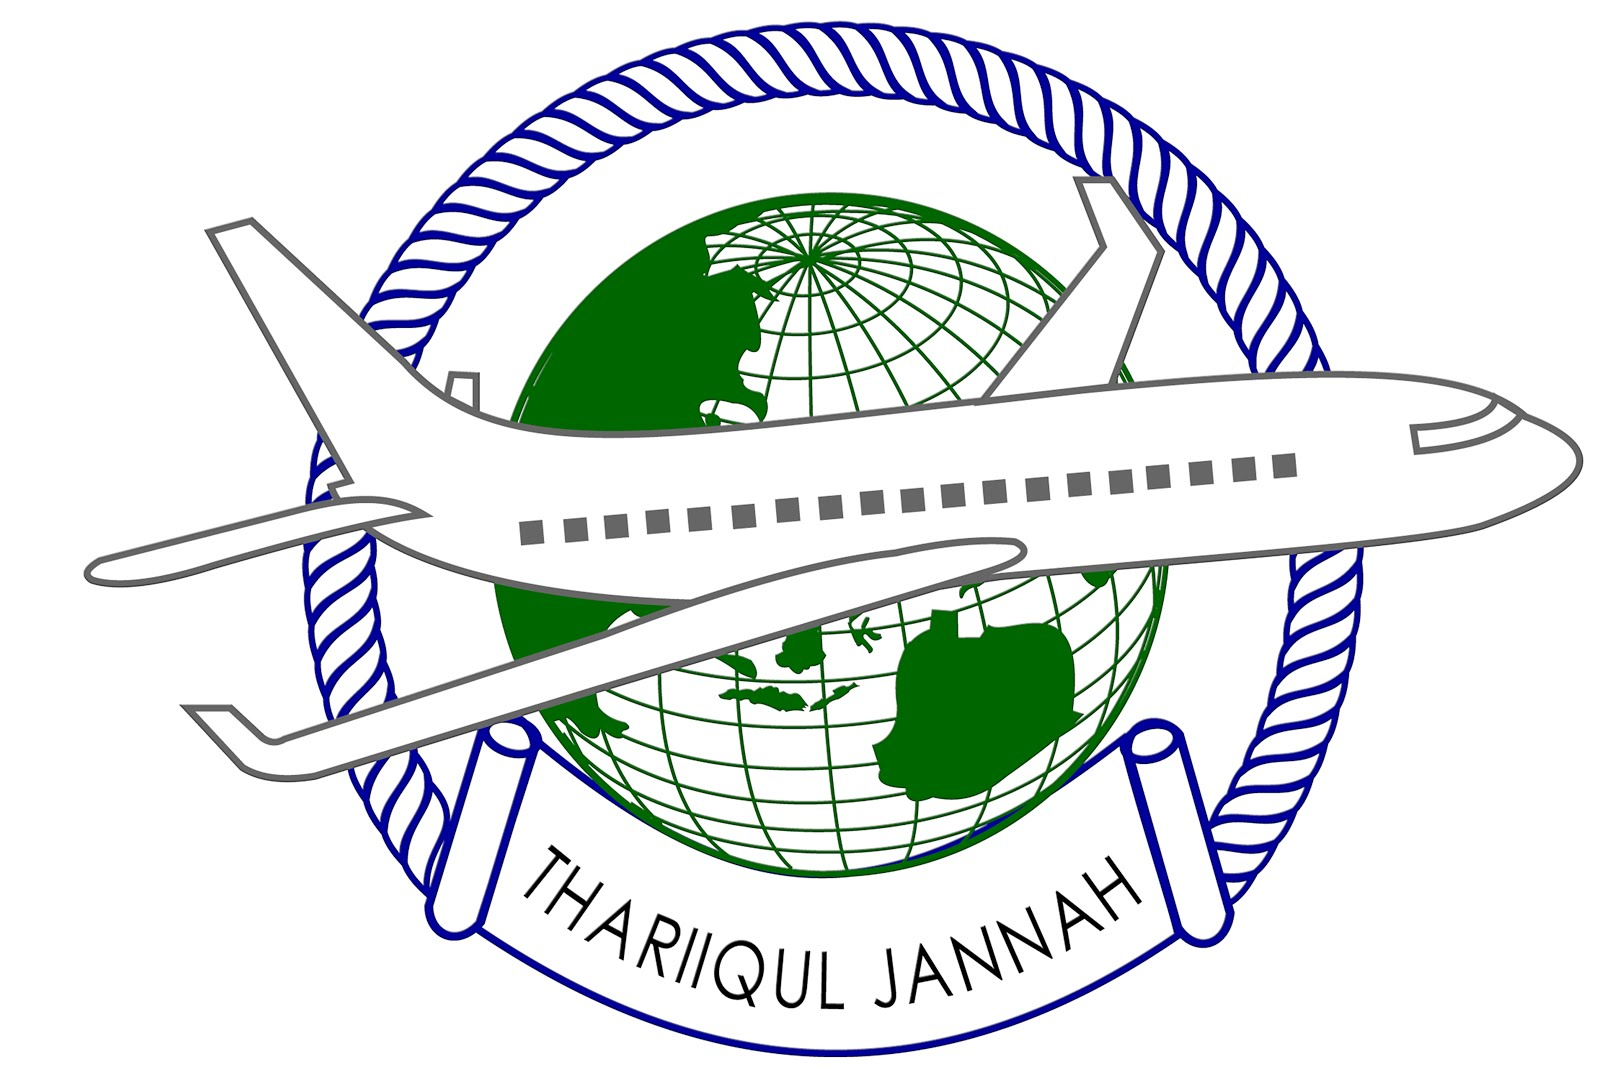 Thariquljannah tour Travel Paket Umrah Murah dan Haji Plus